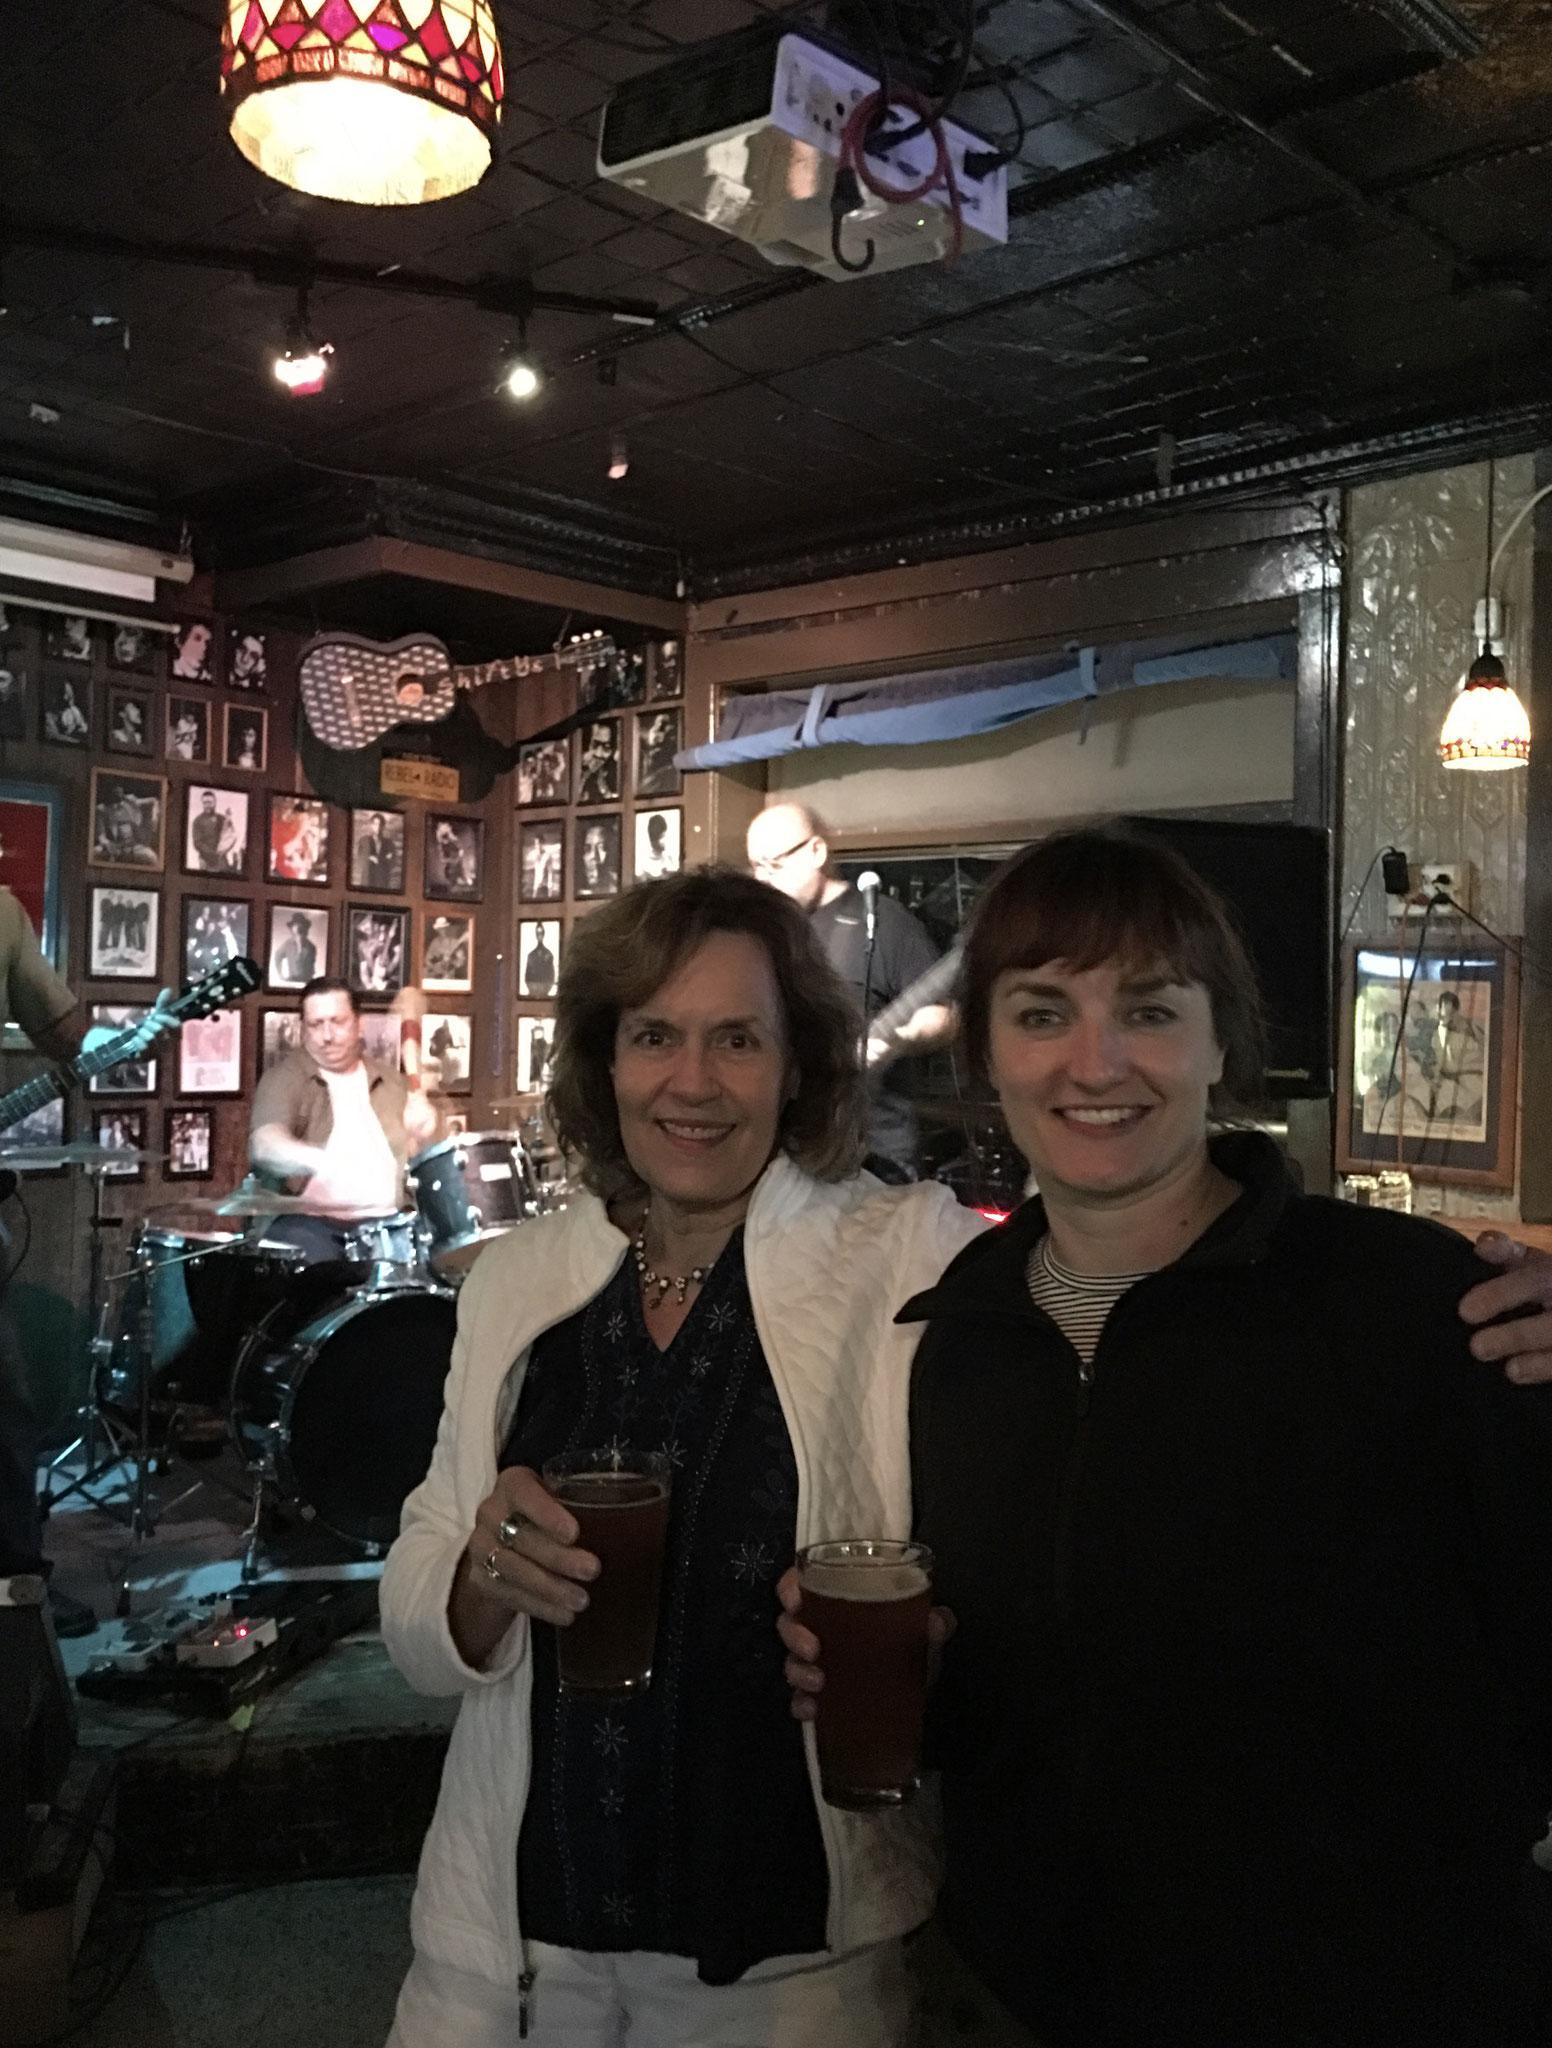 Lorraine & Wendy Barner at Shifty's July, 2019, Syracuse, NY